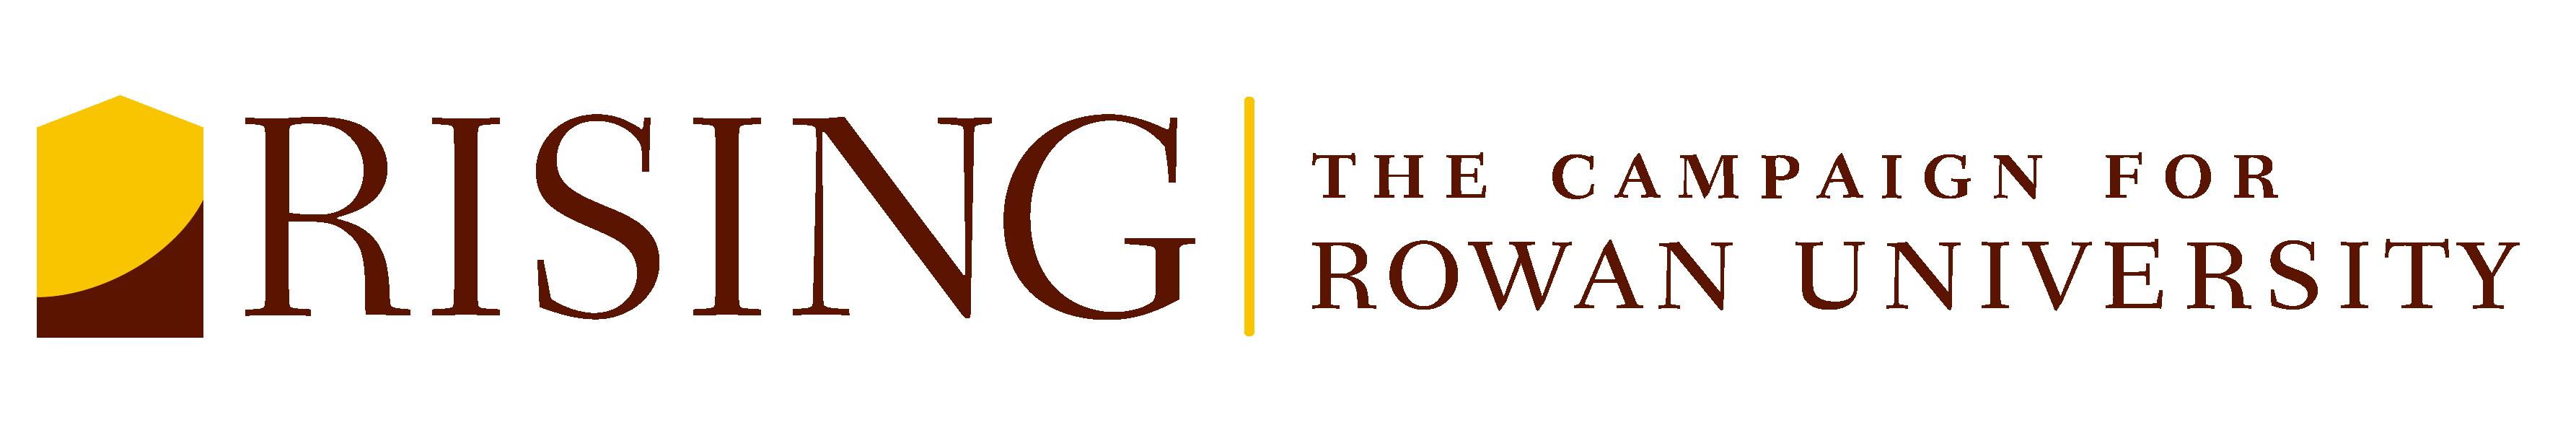 University Advancement Rowan University